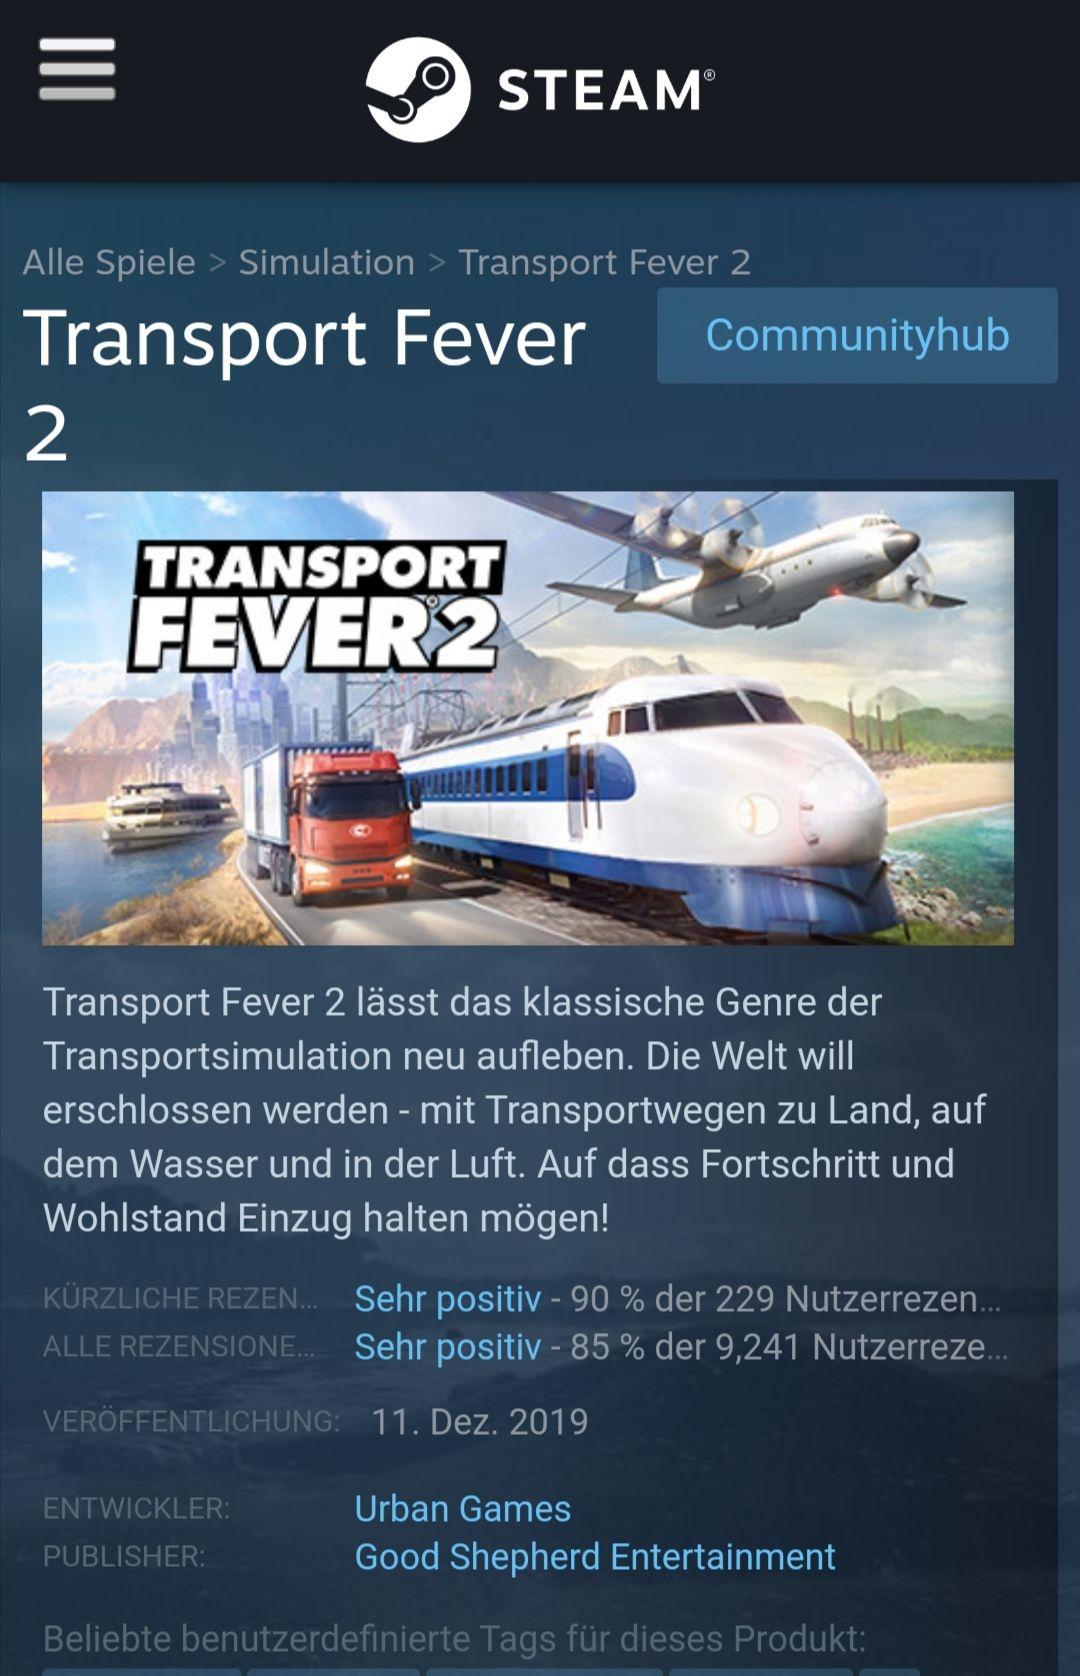 Transport Fever 2 (Steam)